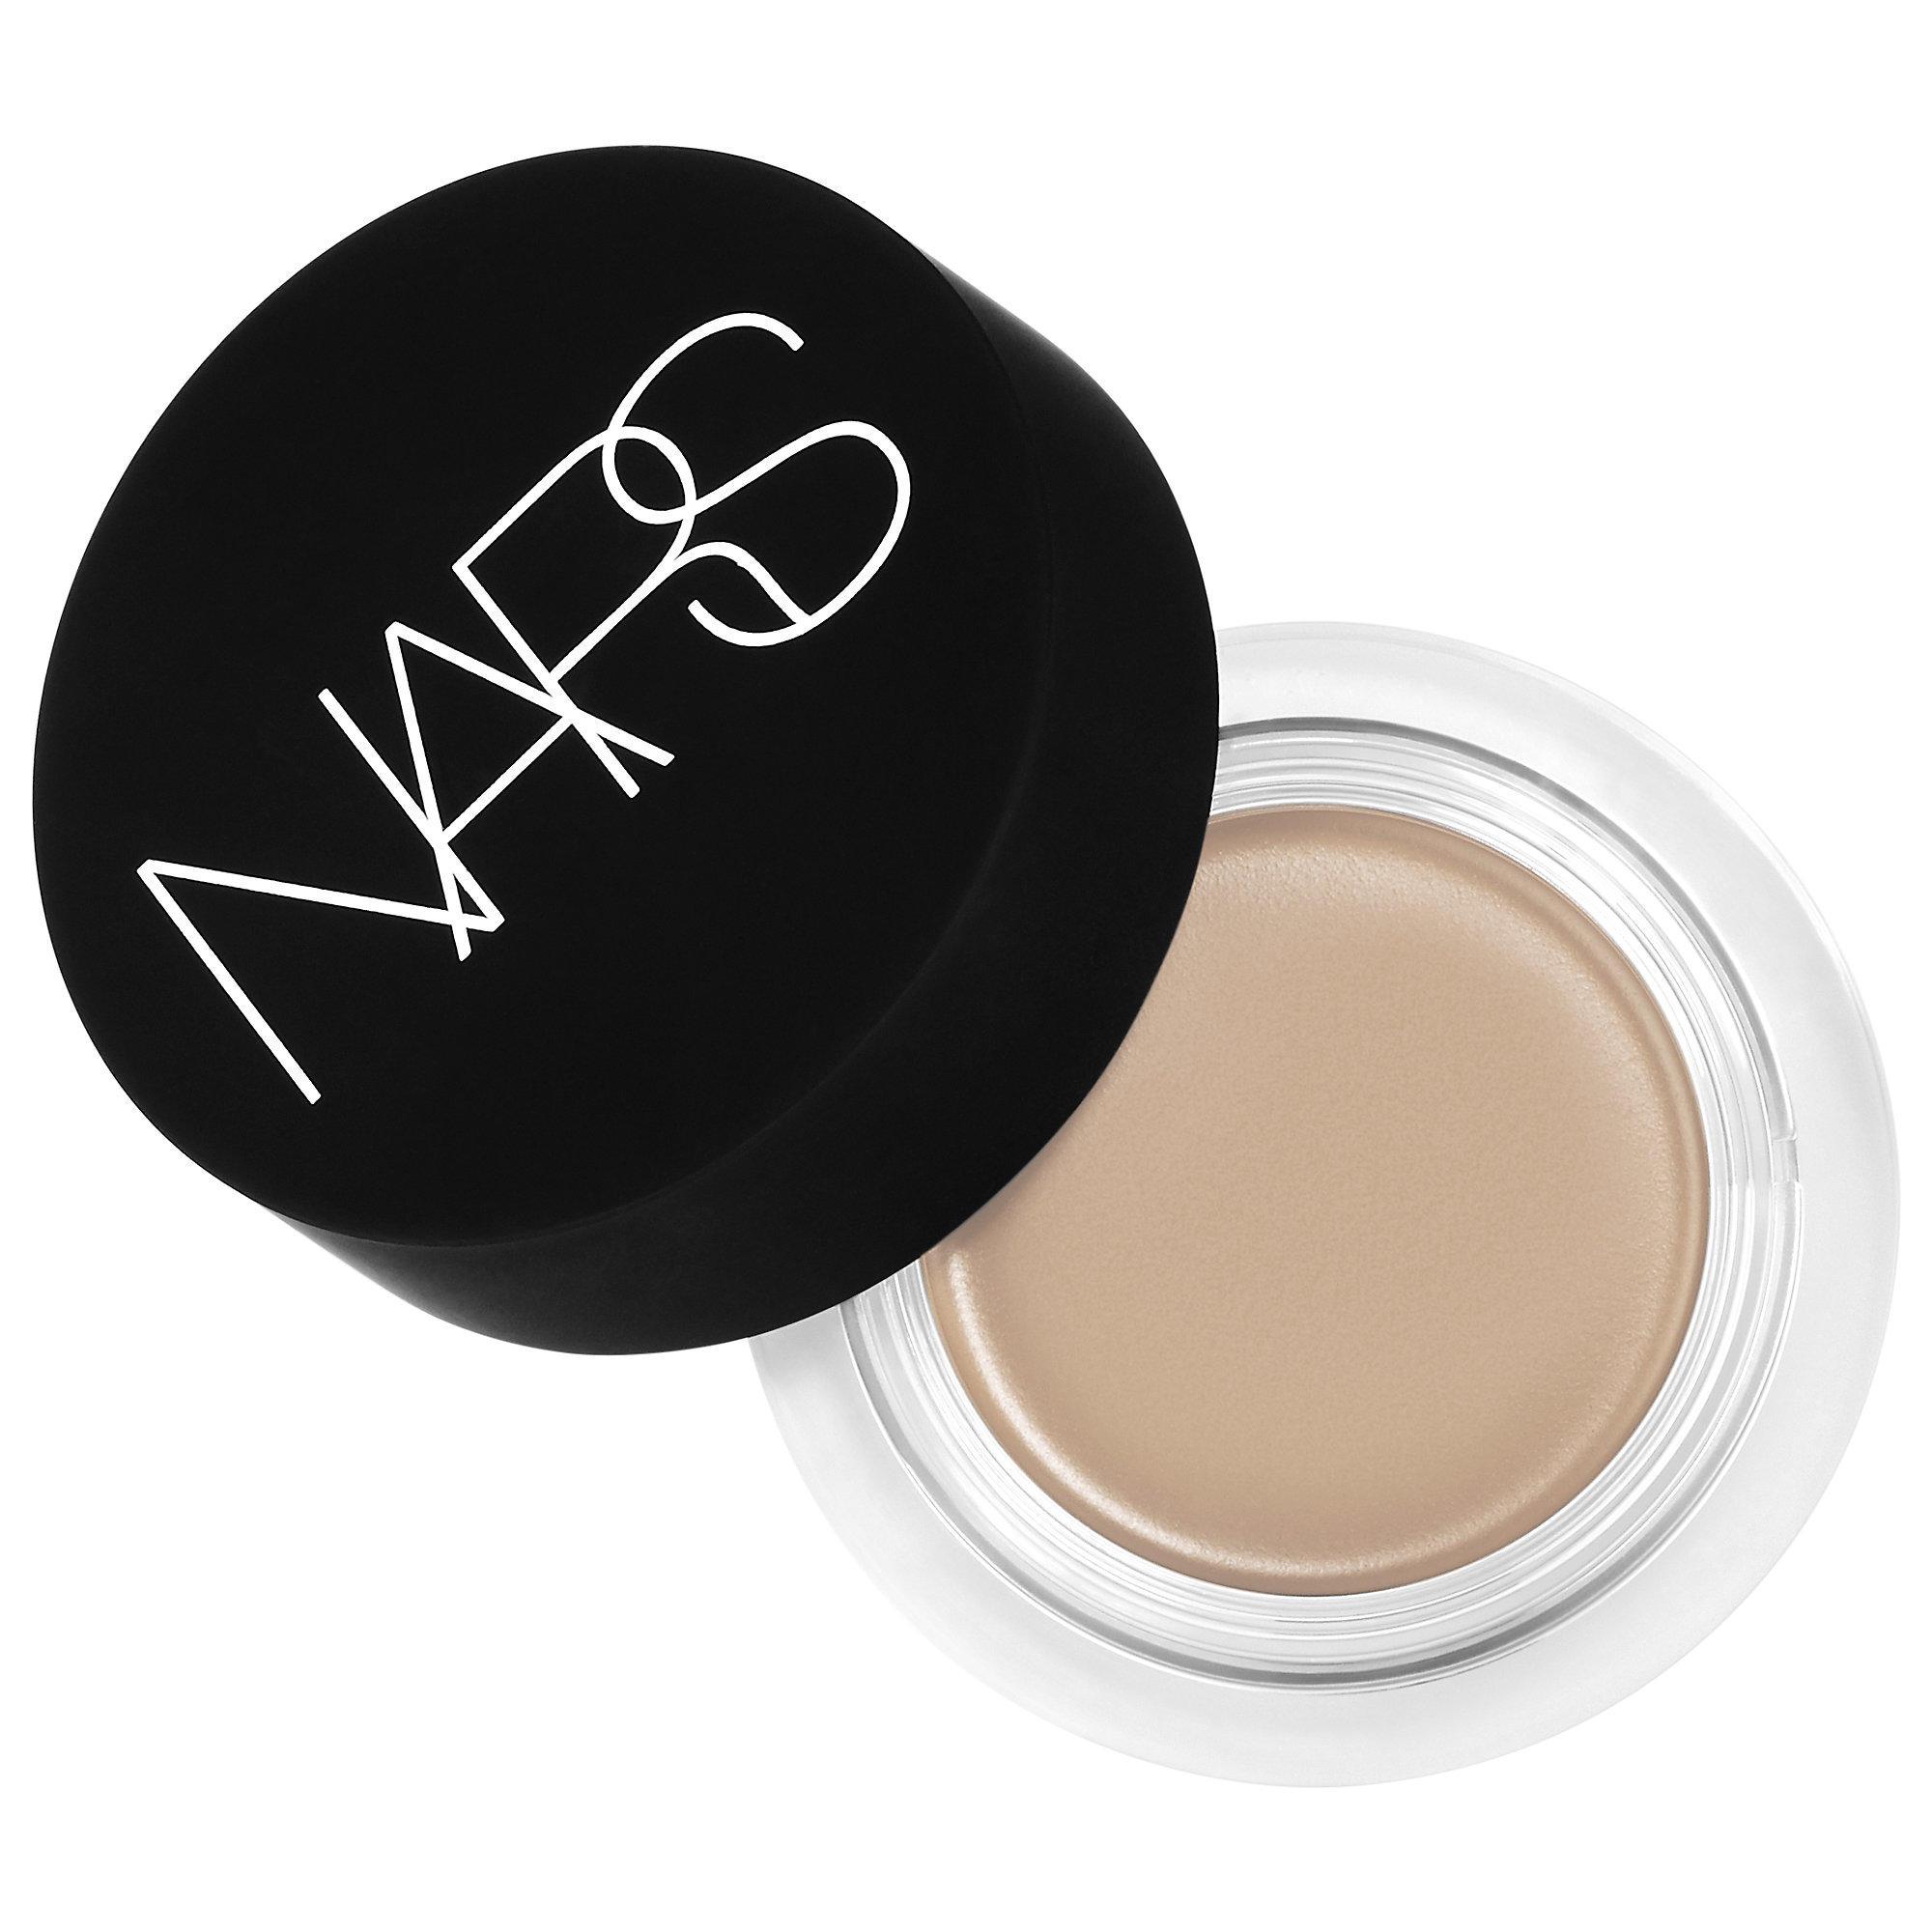 NARS Soft Matte Complete Concealer Custard Medium 1